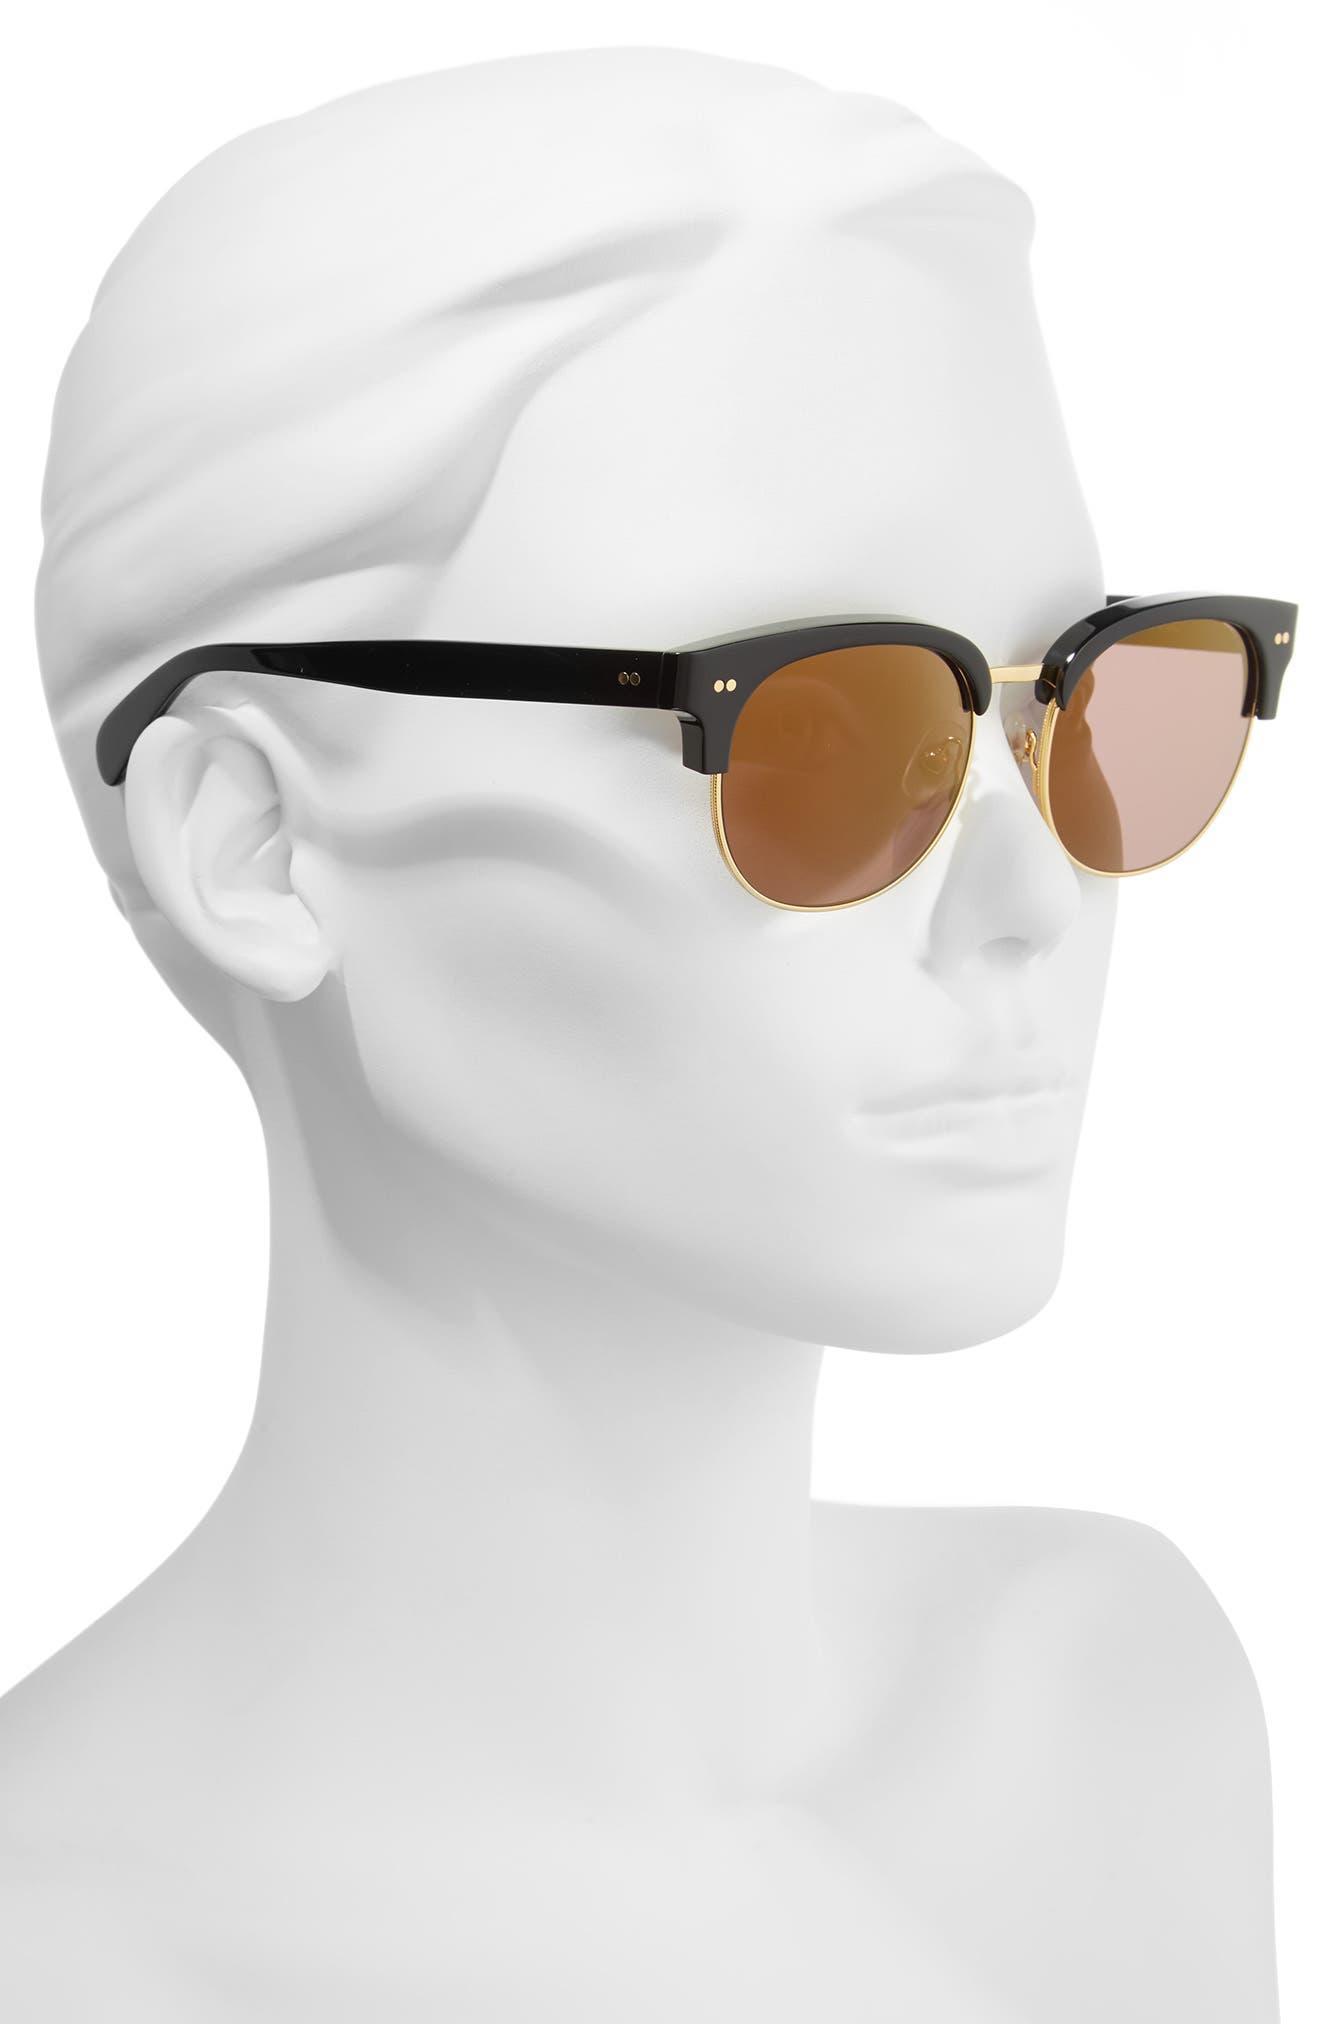 WILDFOX, Clubhouse 50mm Semi-Rimless Sunglasses, Alternate thumbnail 2, color, BLACK/ GOLD